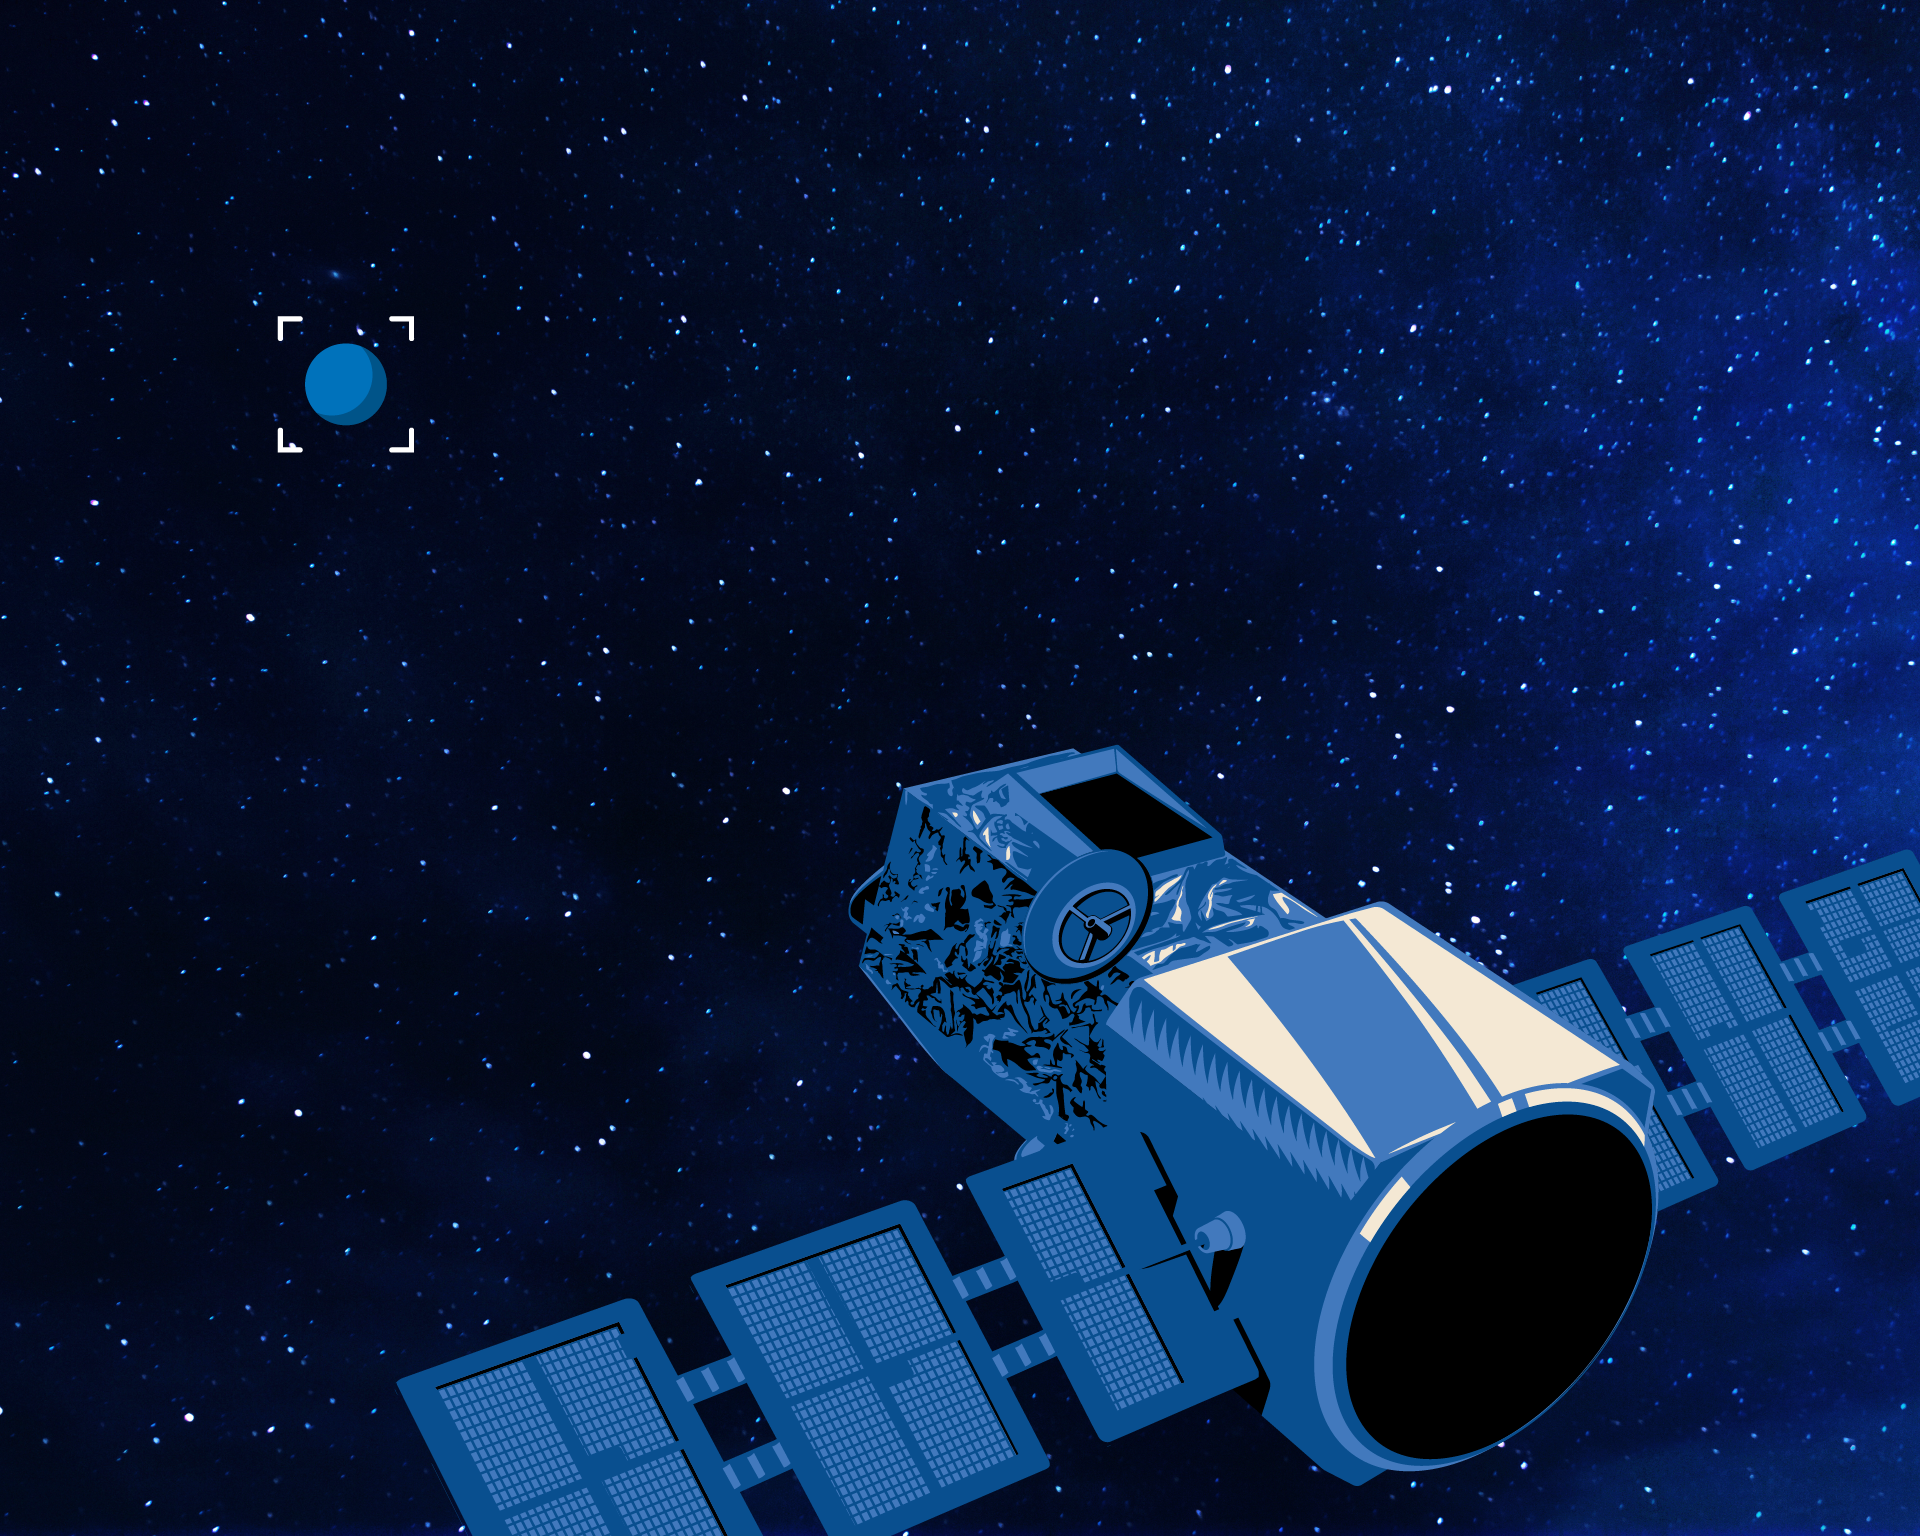 Project Blue #SearchForSisterEarth Fullscreen Wallpaper